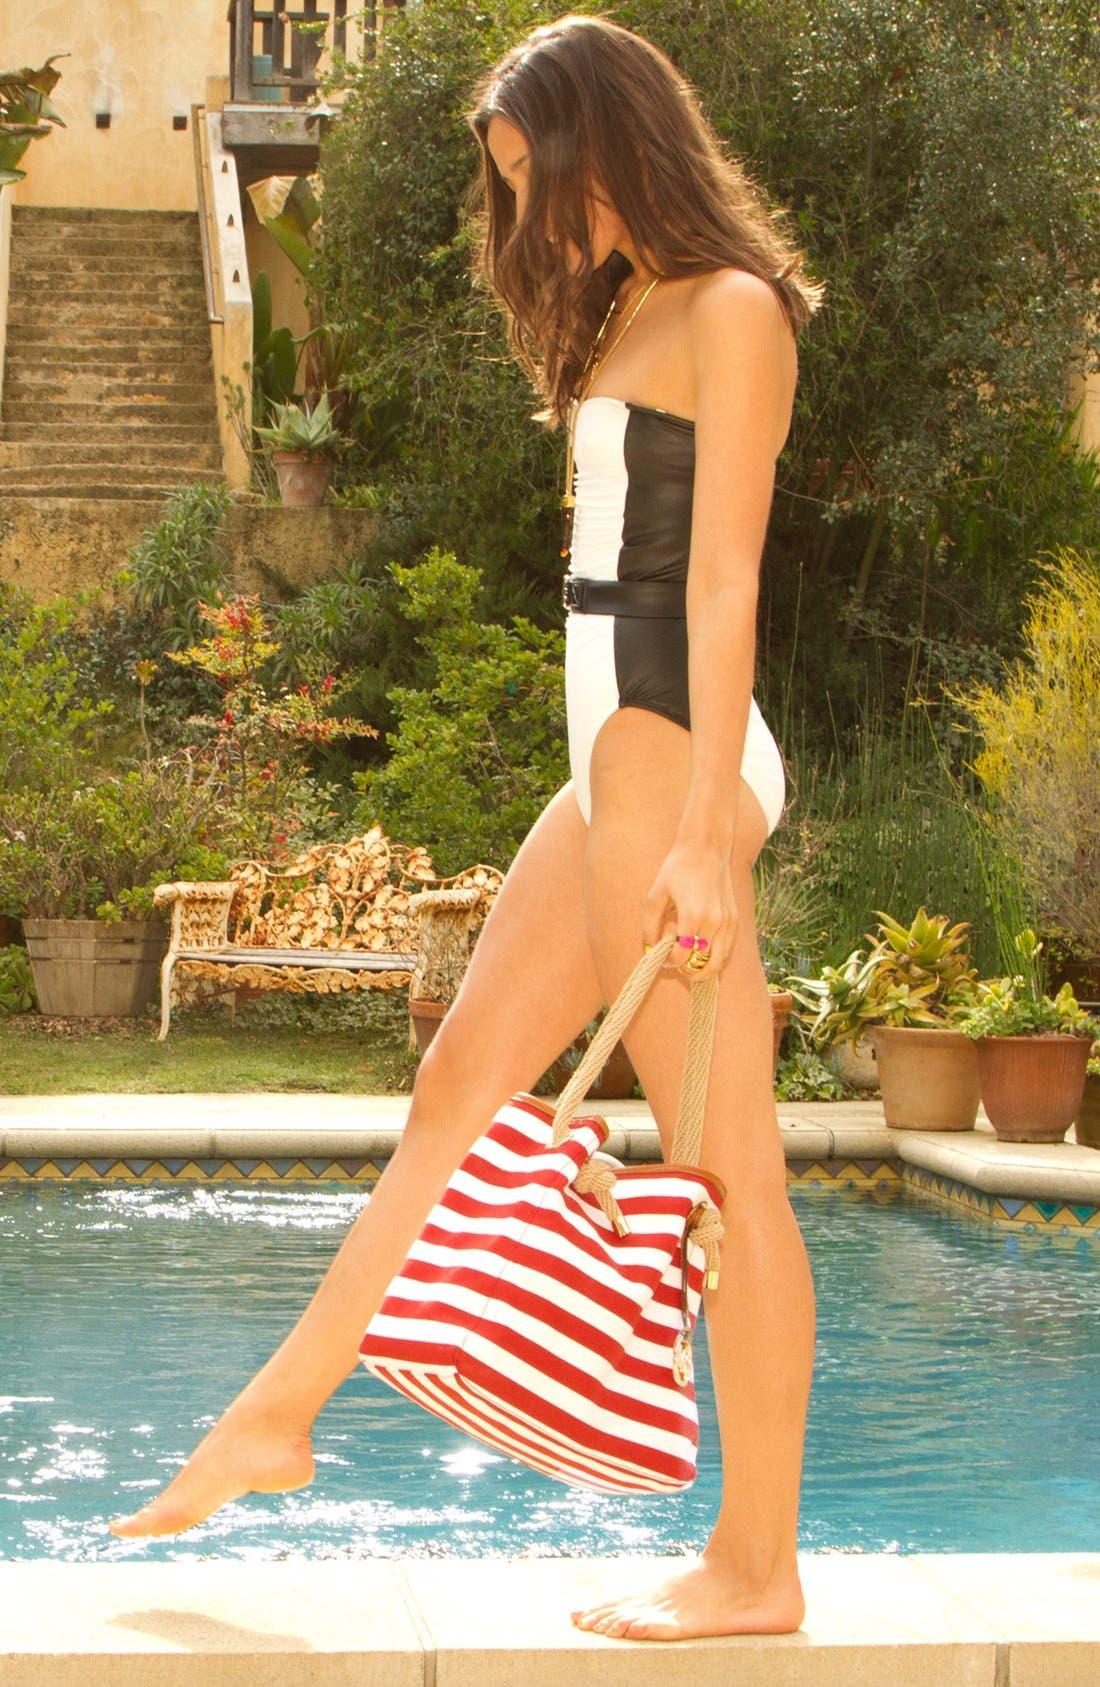 MICHAEL MICHAEL KORS,                             Belted Strapless Swimsuit,                             Alternate thumbnail 3, color,                             100